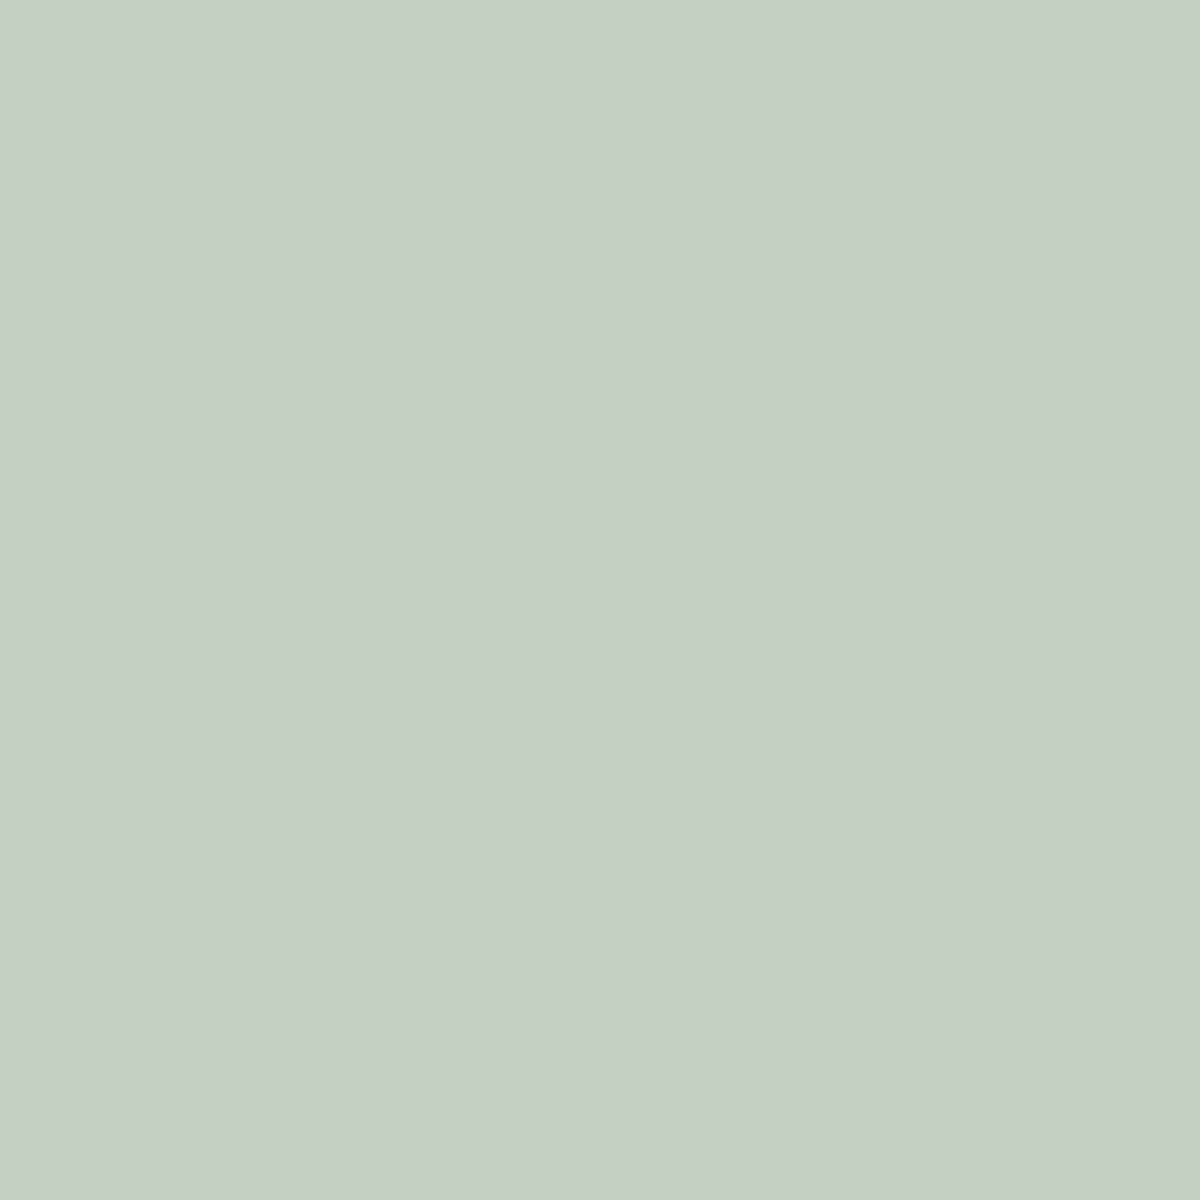 Ironworks Radiators Inc. little Greene, Salix paint finish